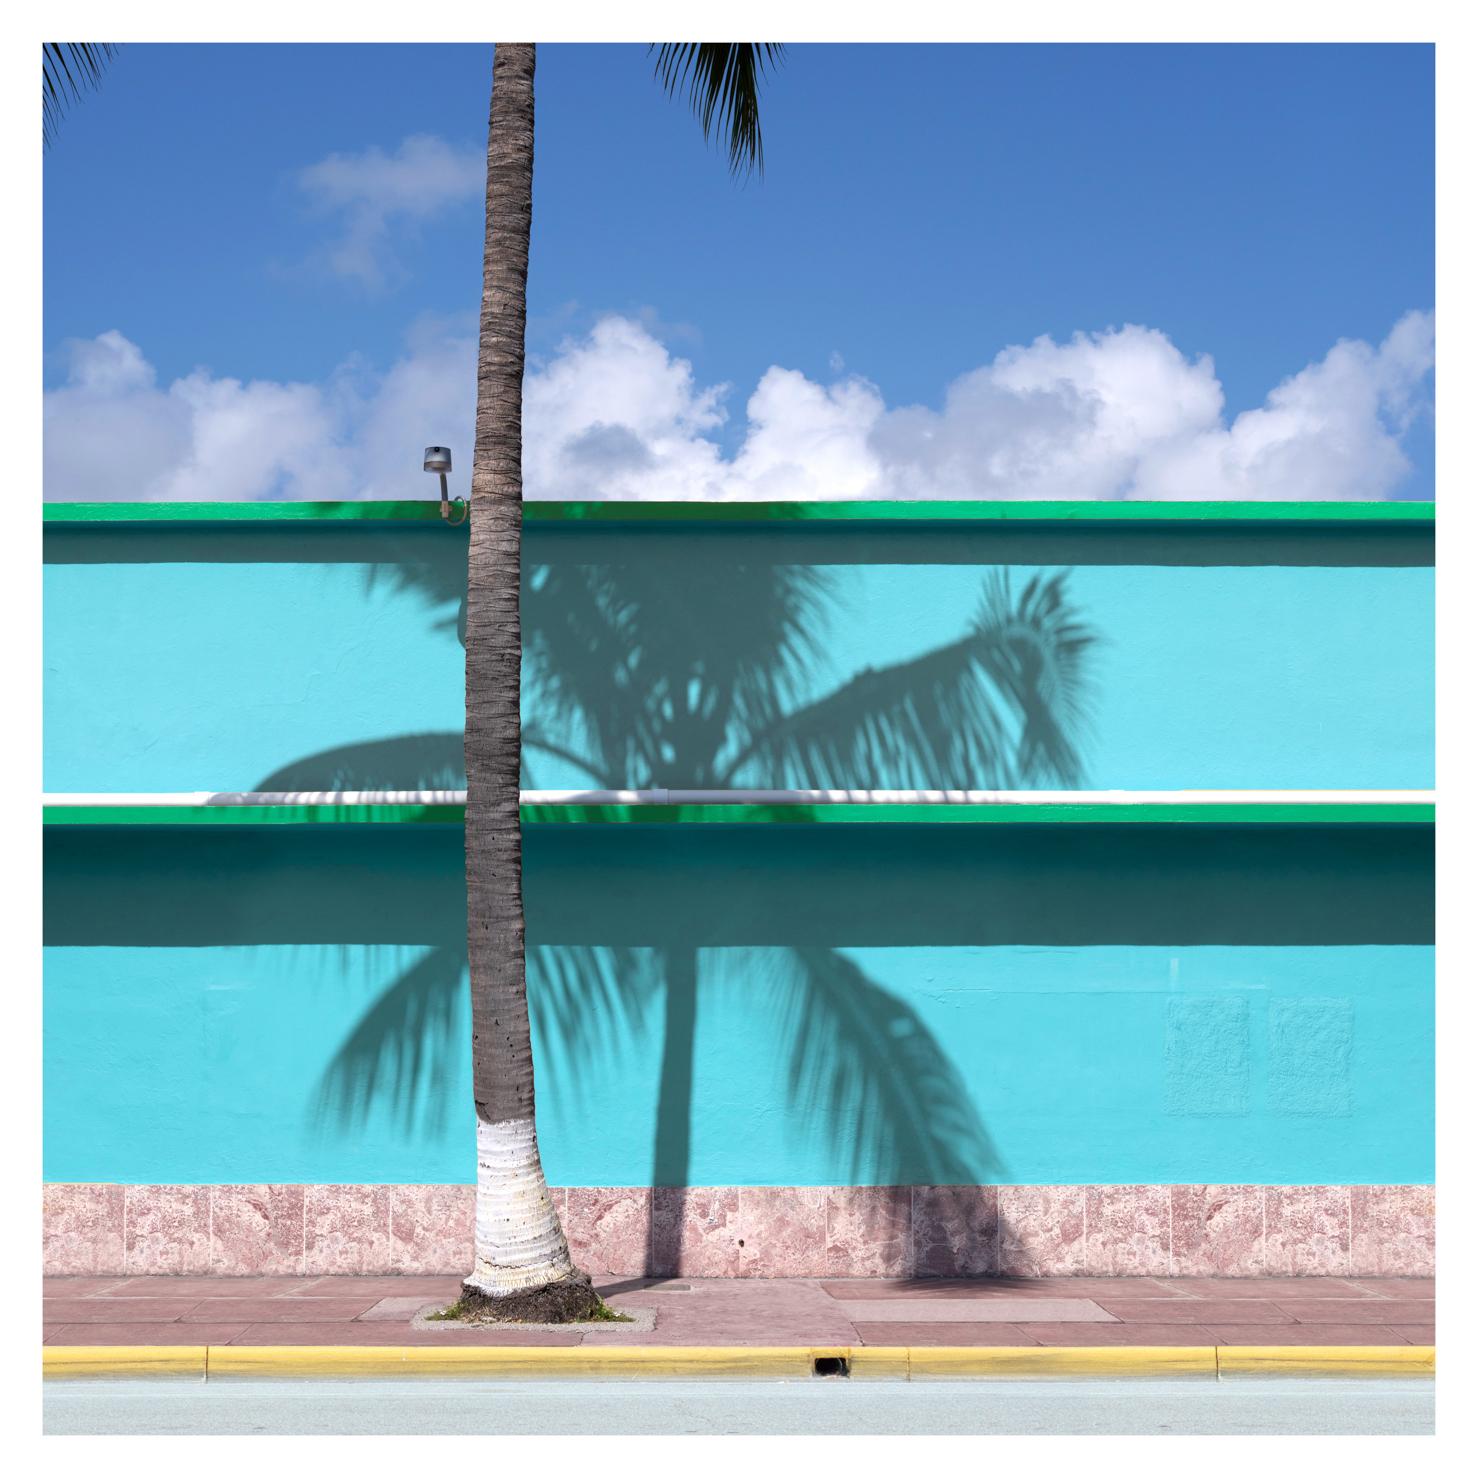 george-byrne-olsen-gruin-13-Blue-Wall-Miami-2019-FNL-Small-Border